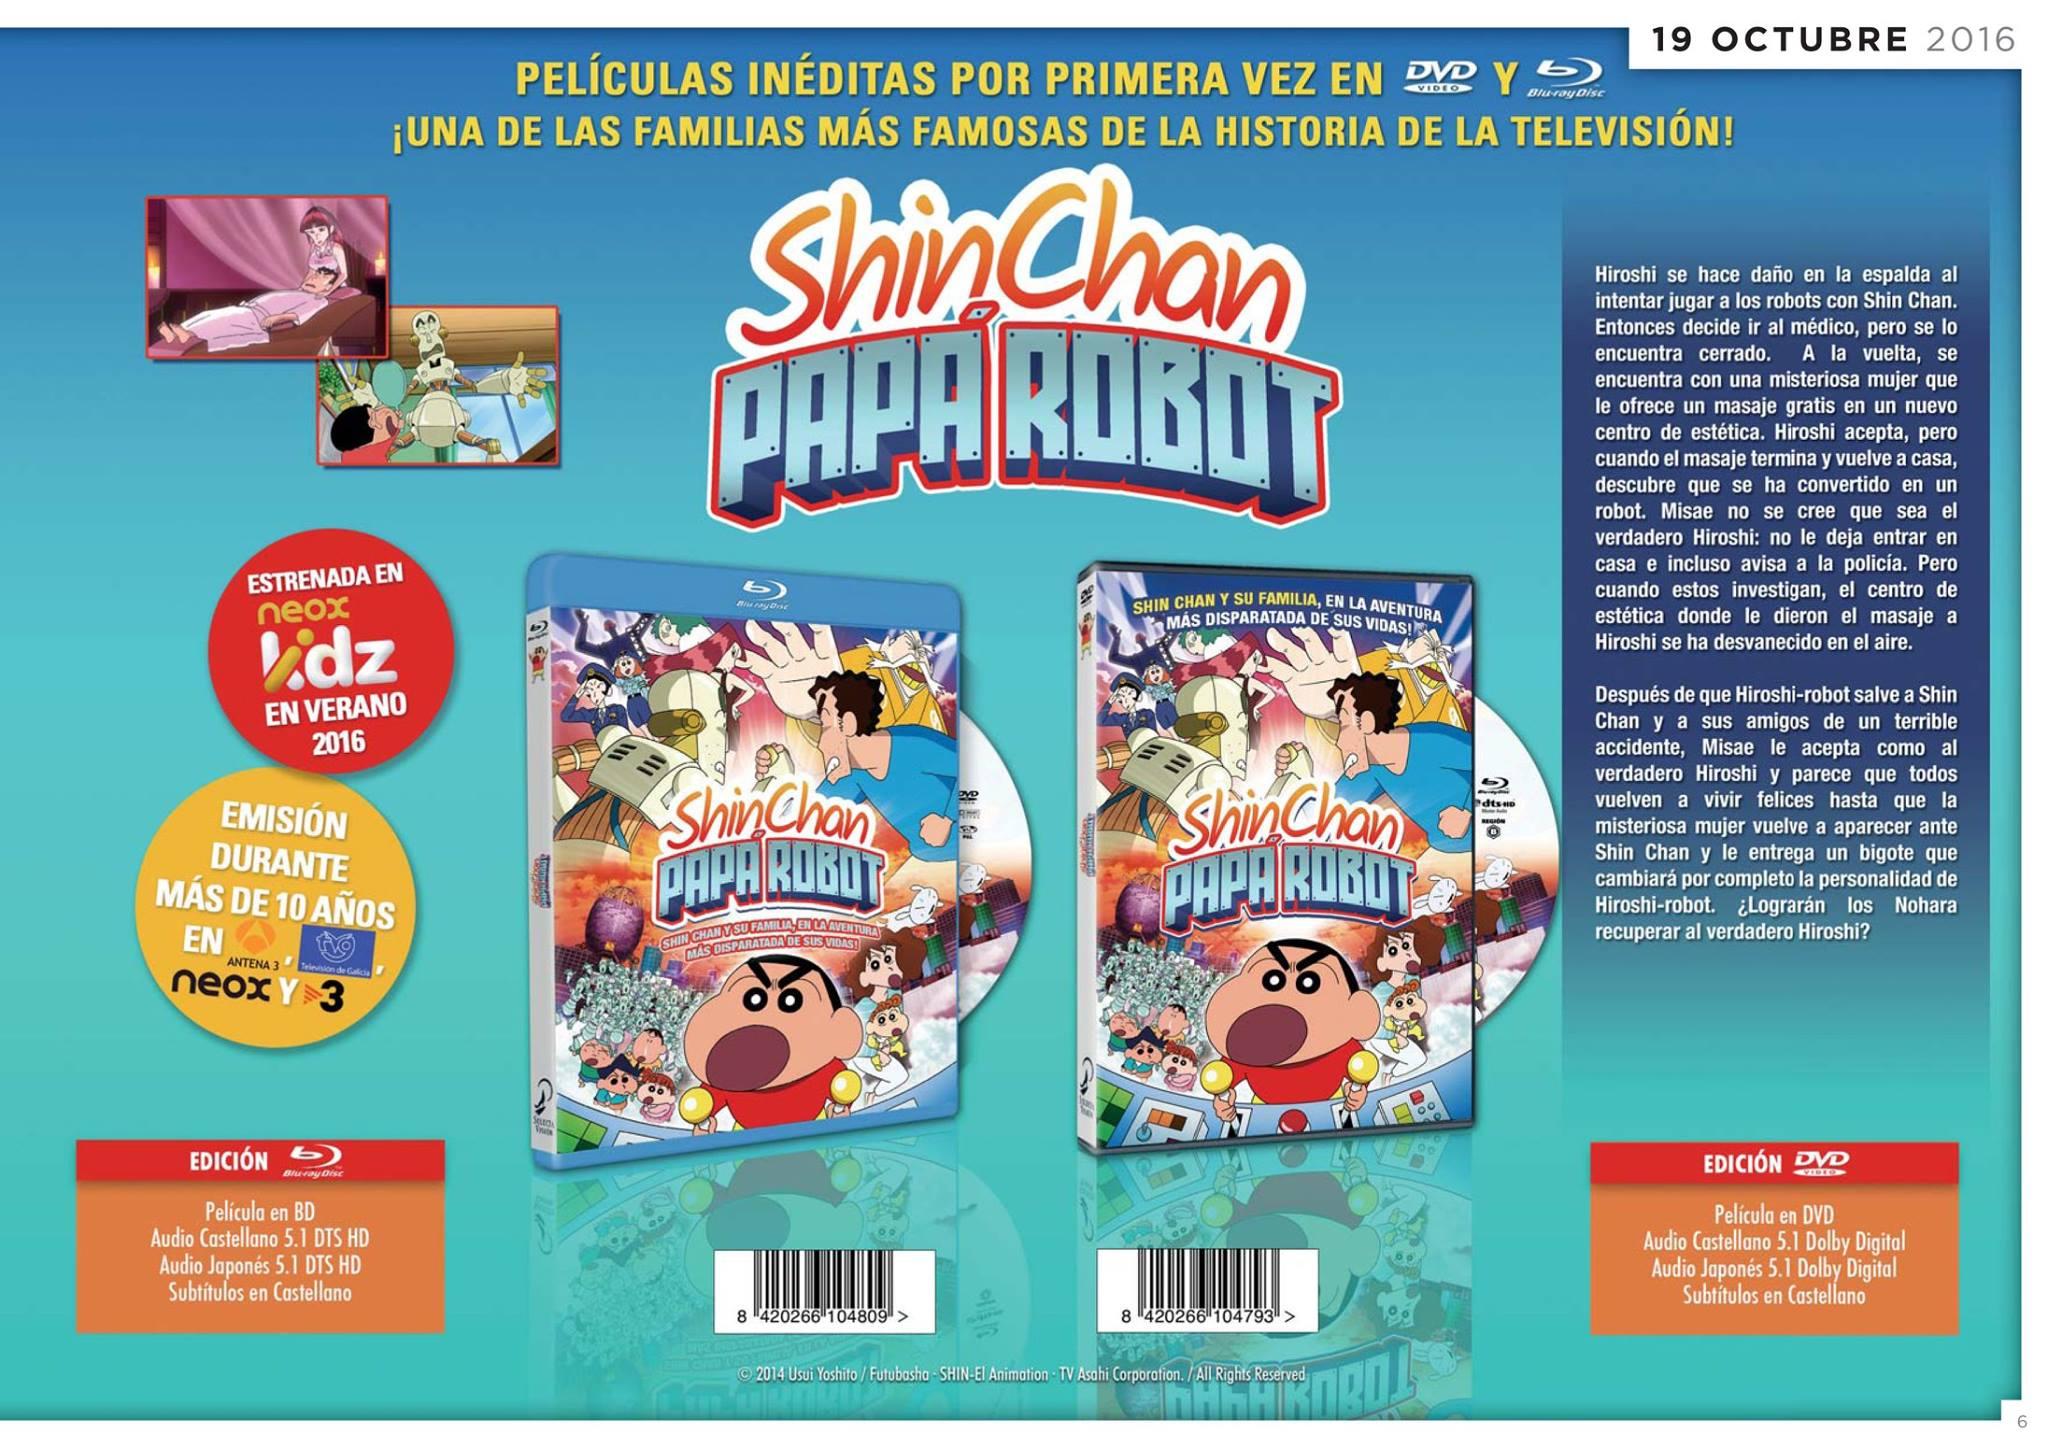 shin chan papa robot promo